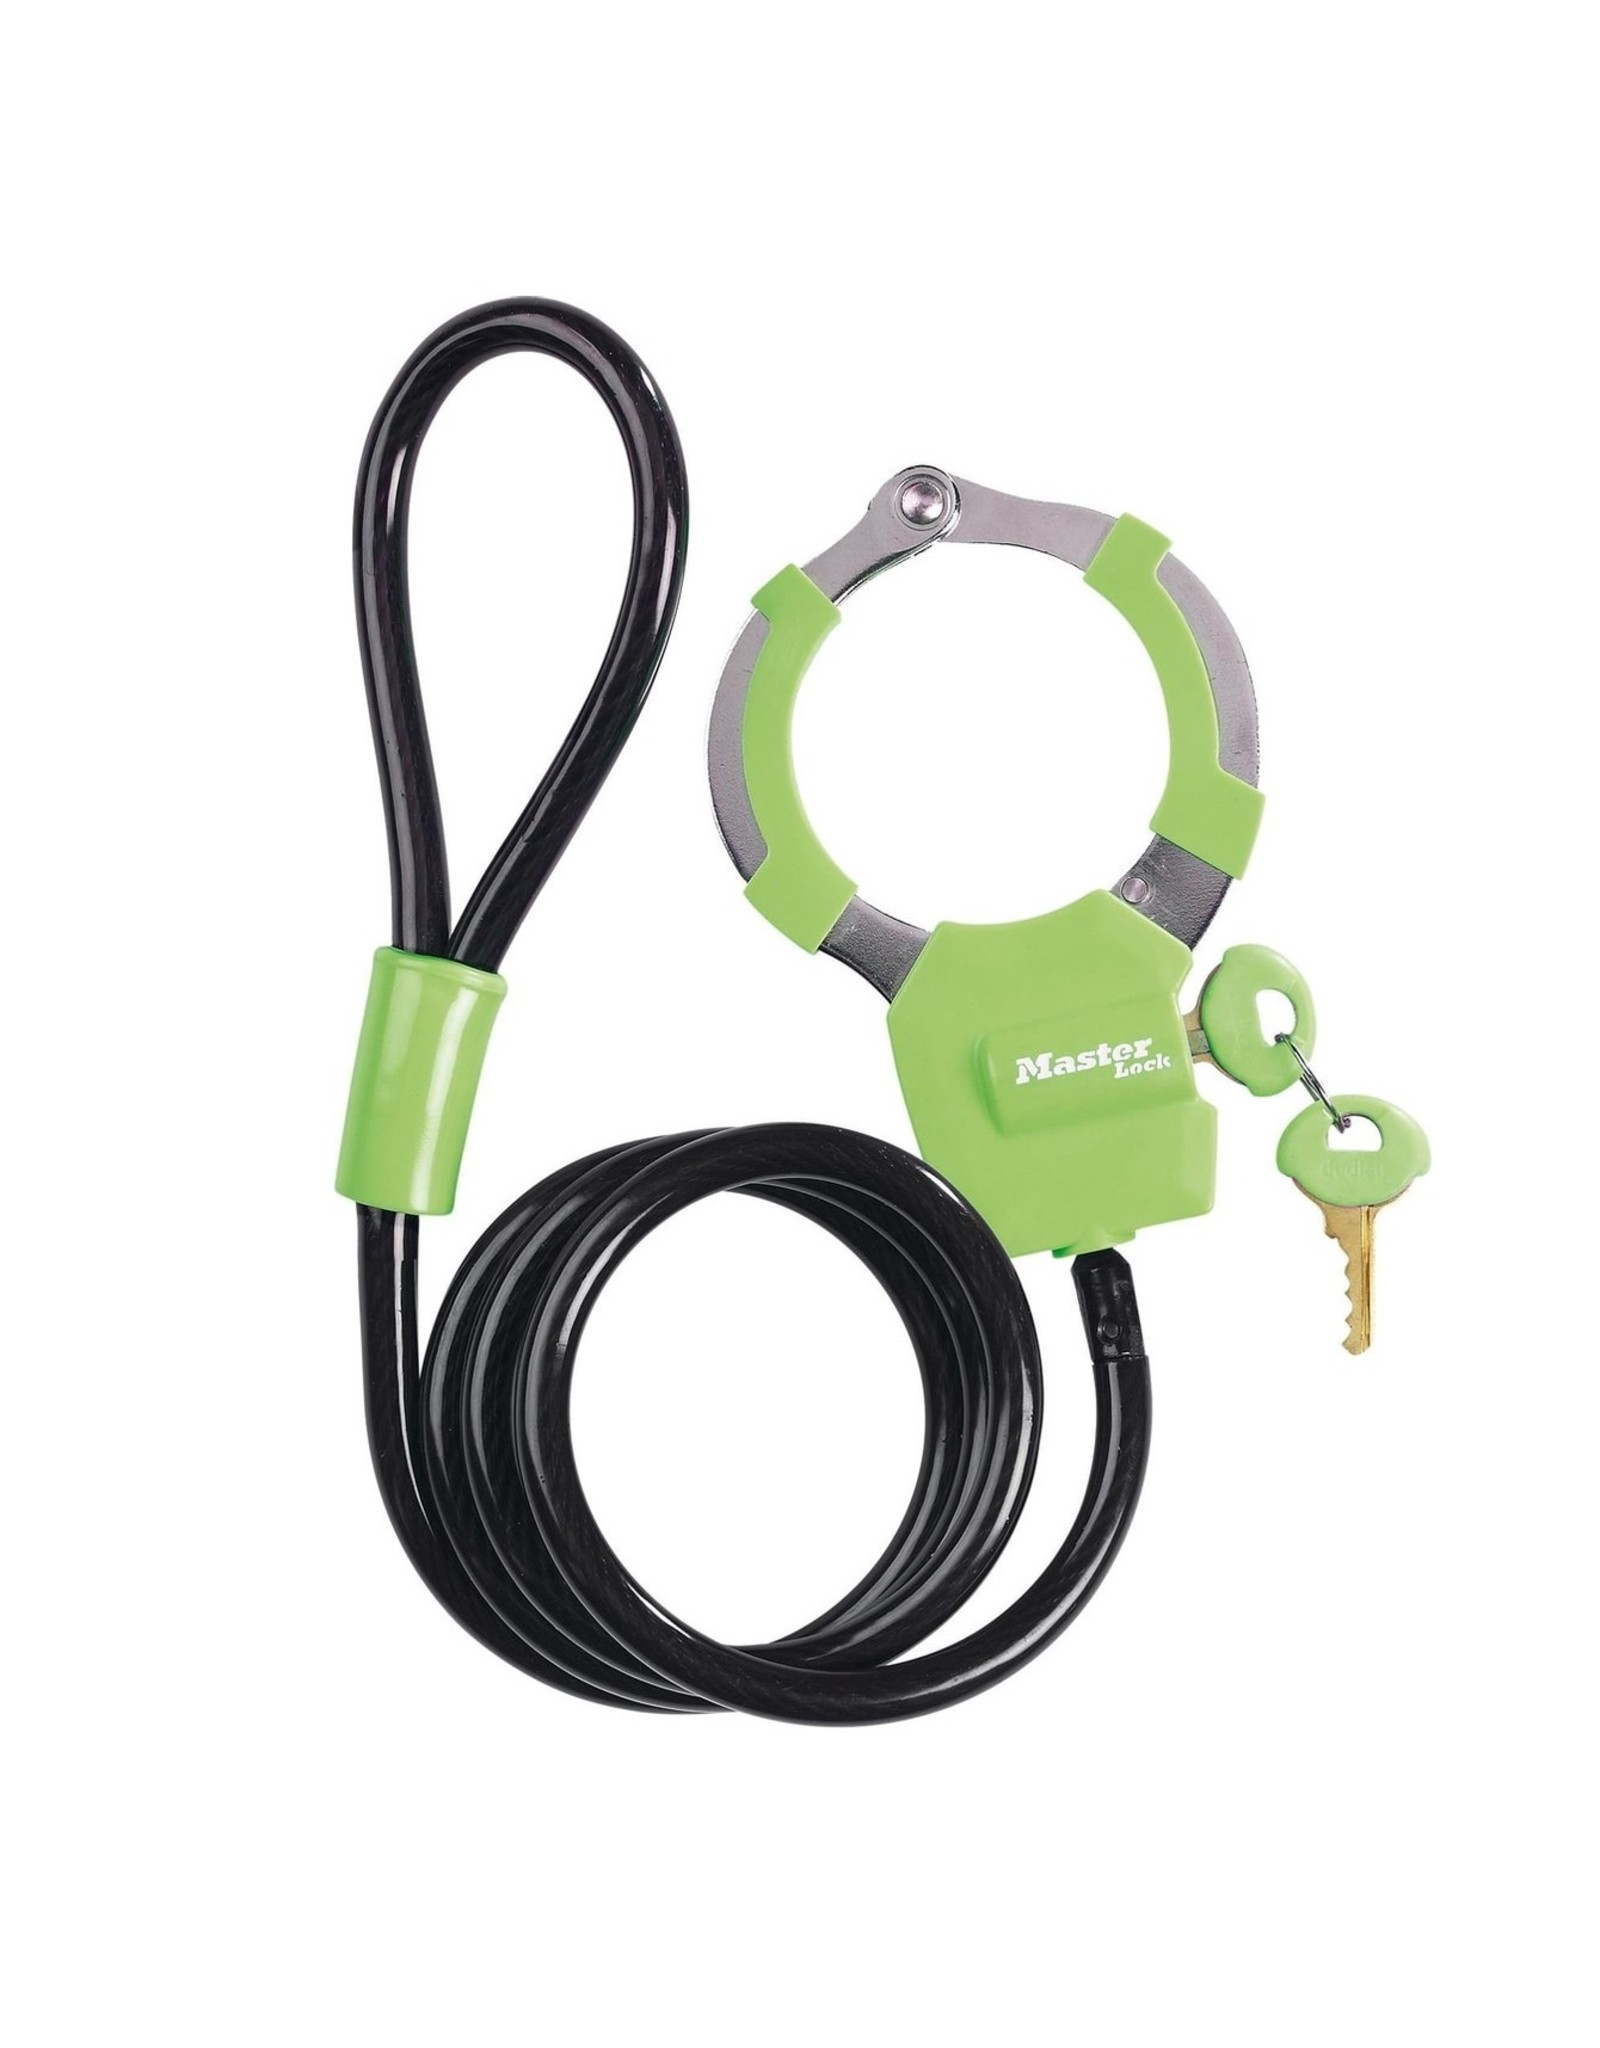 MasterLock MasterLock - Kabelslot - 1 meter -  Groen